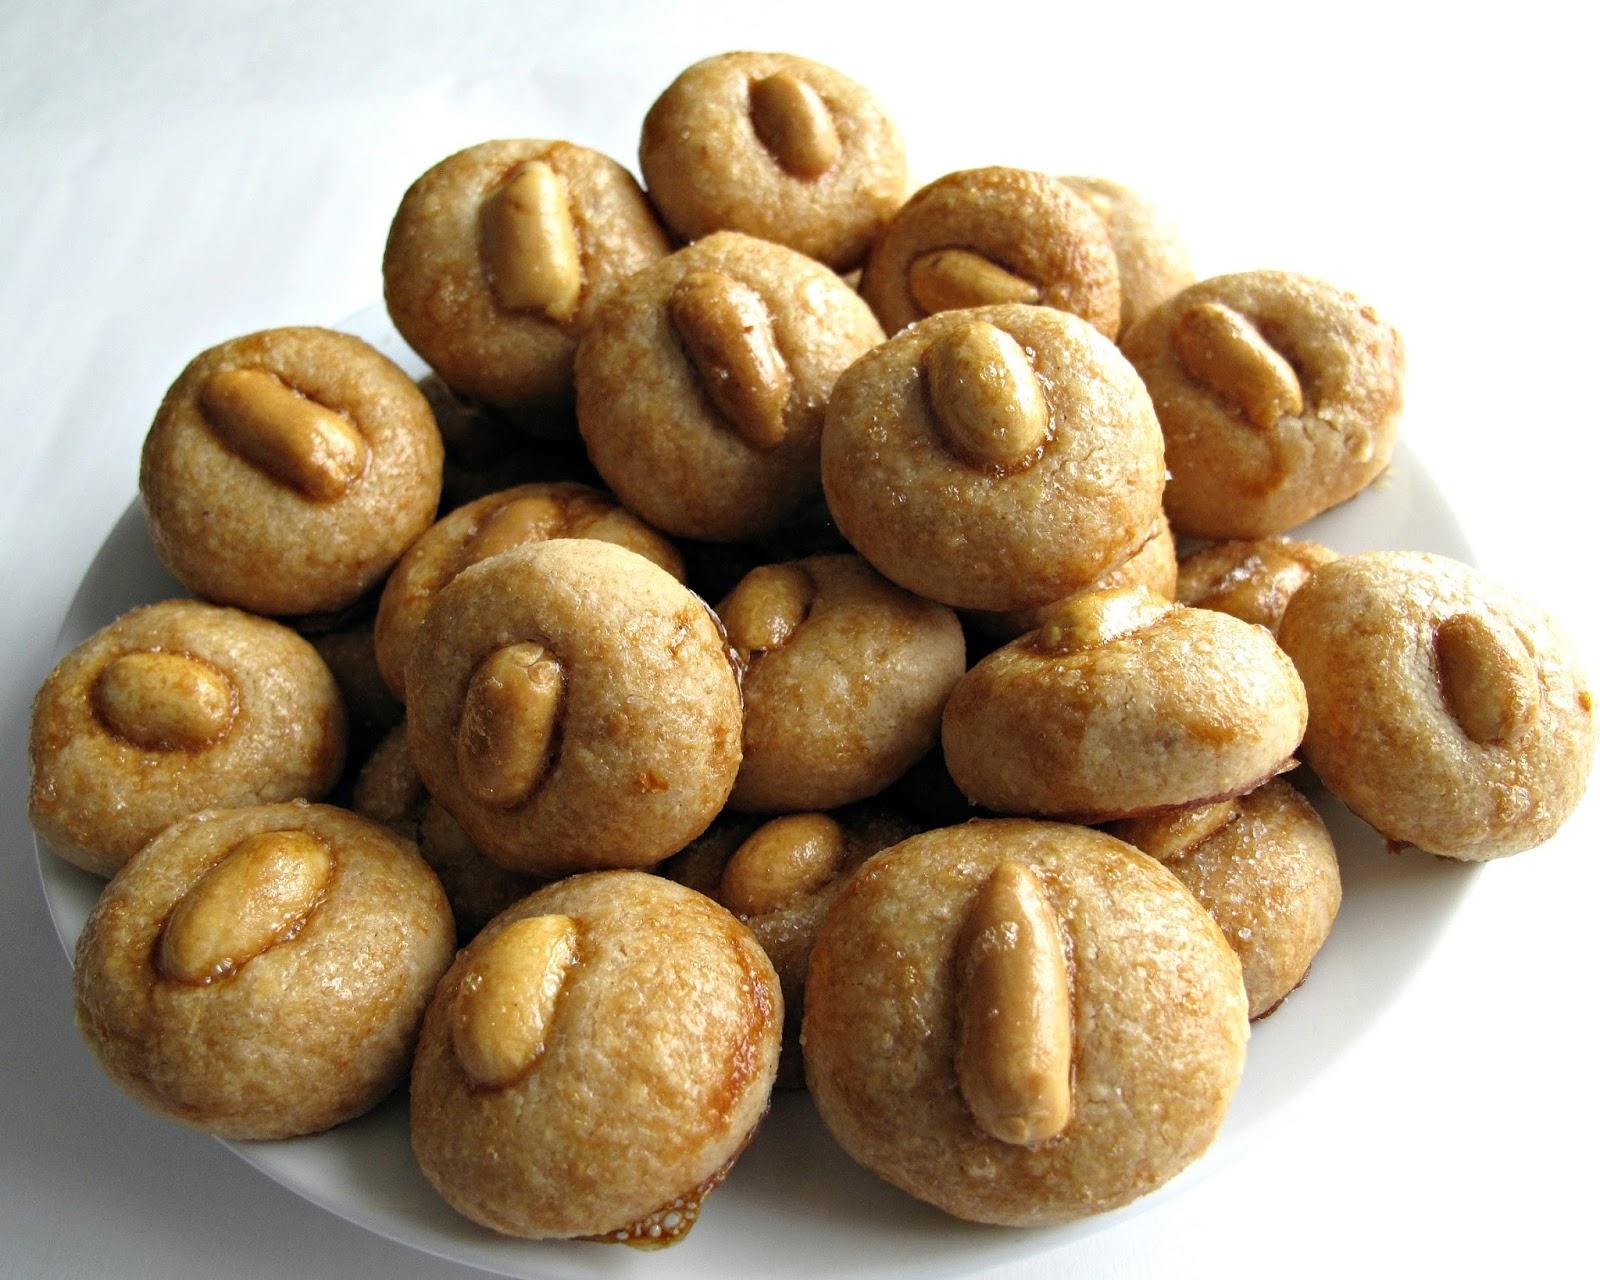 Resep Kue Kacang Maknyus Aneka Resep Masakan